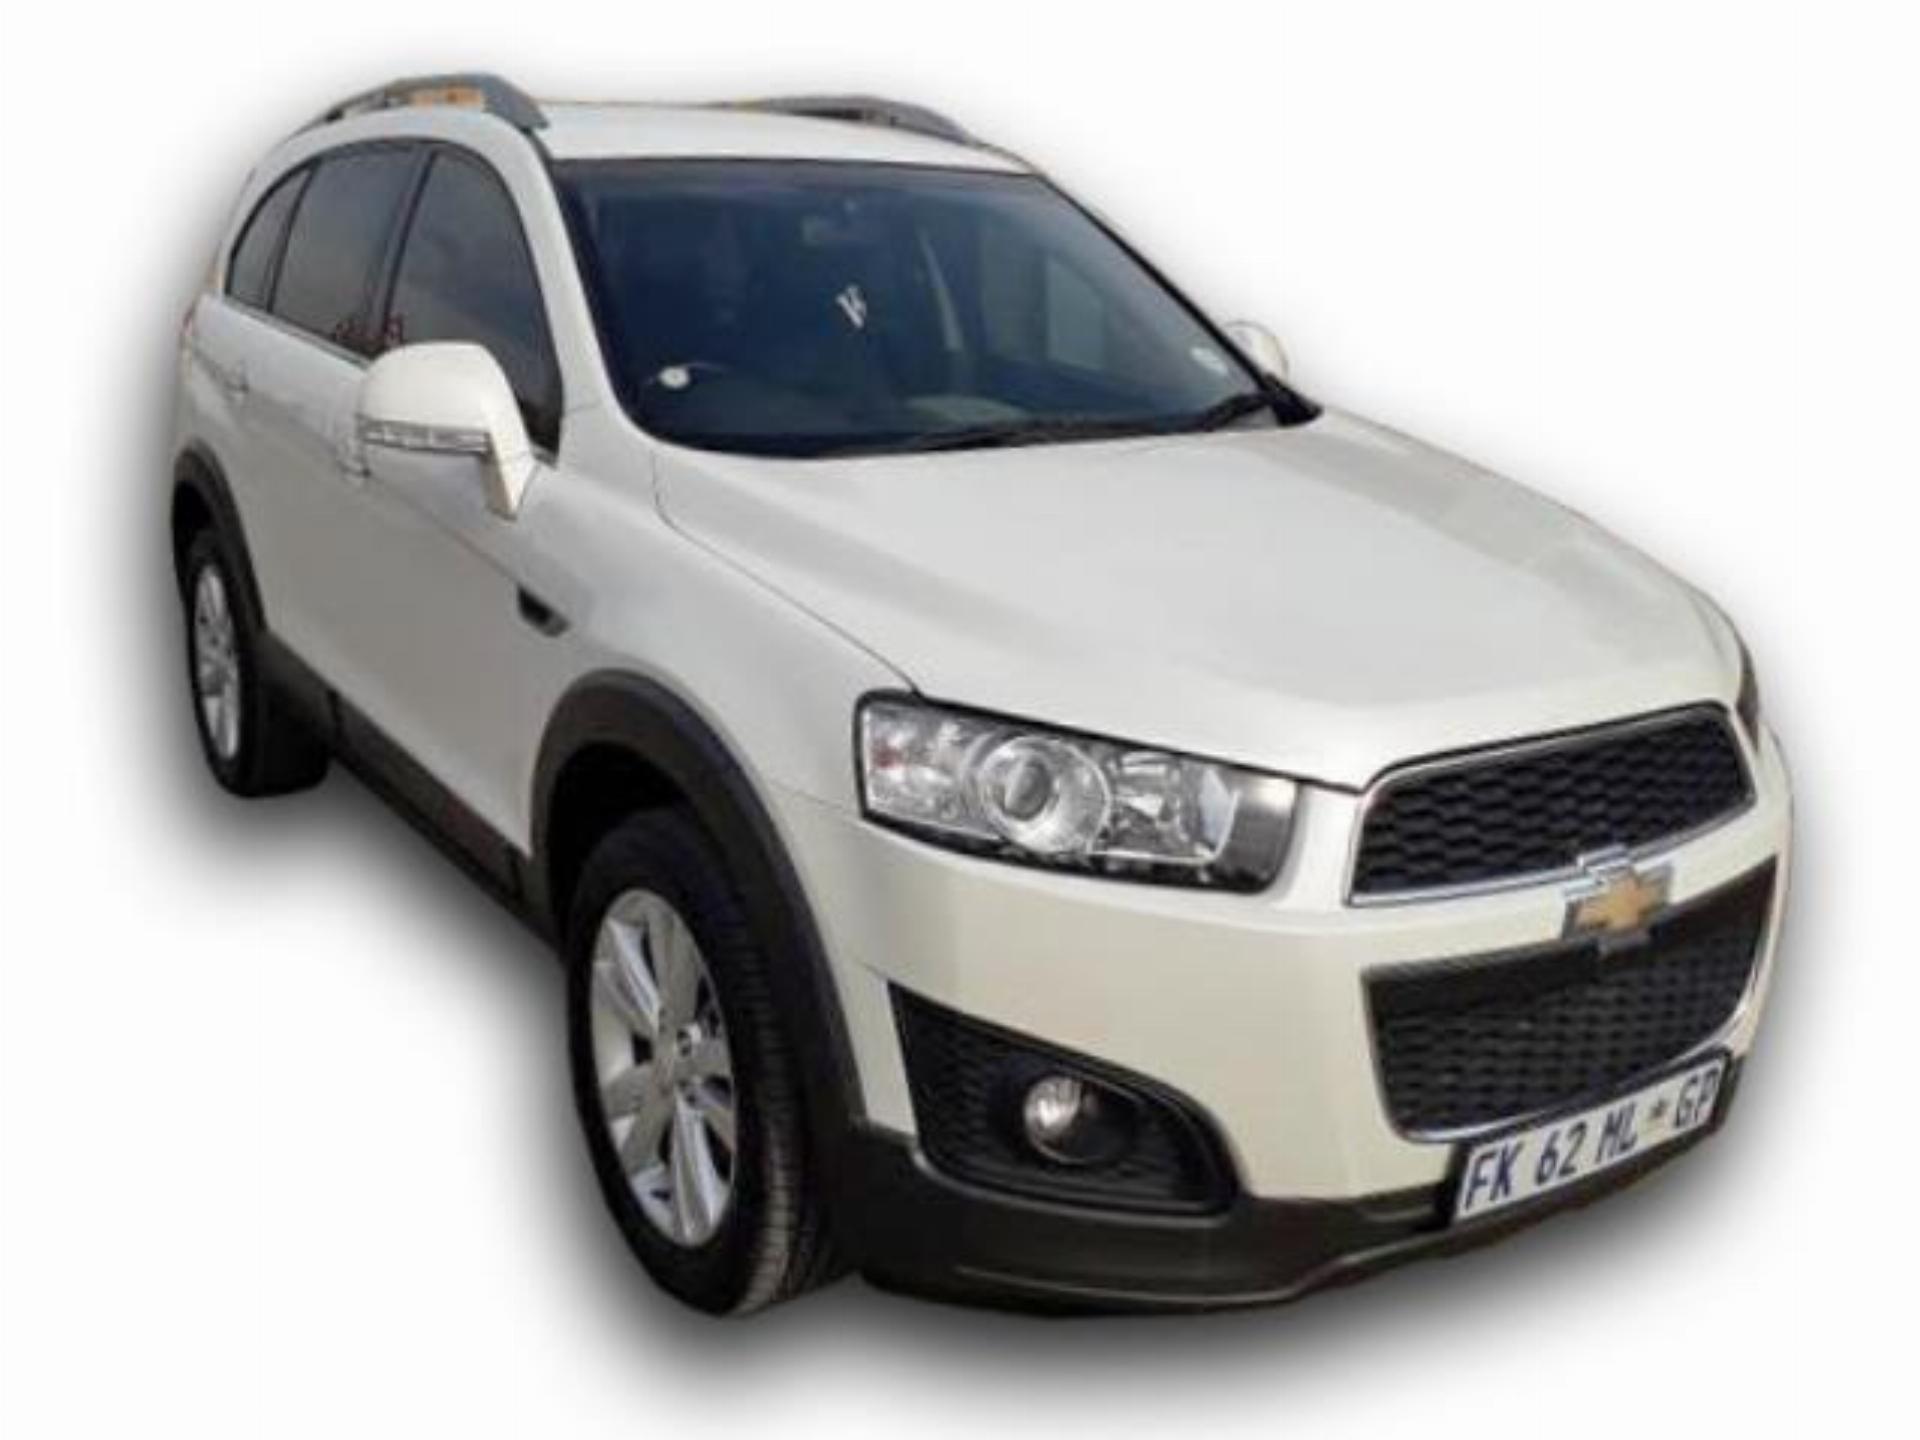 Chevrolet Captiva 2.4 Petrol